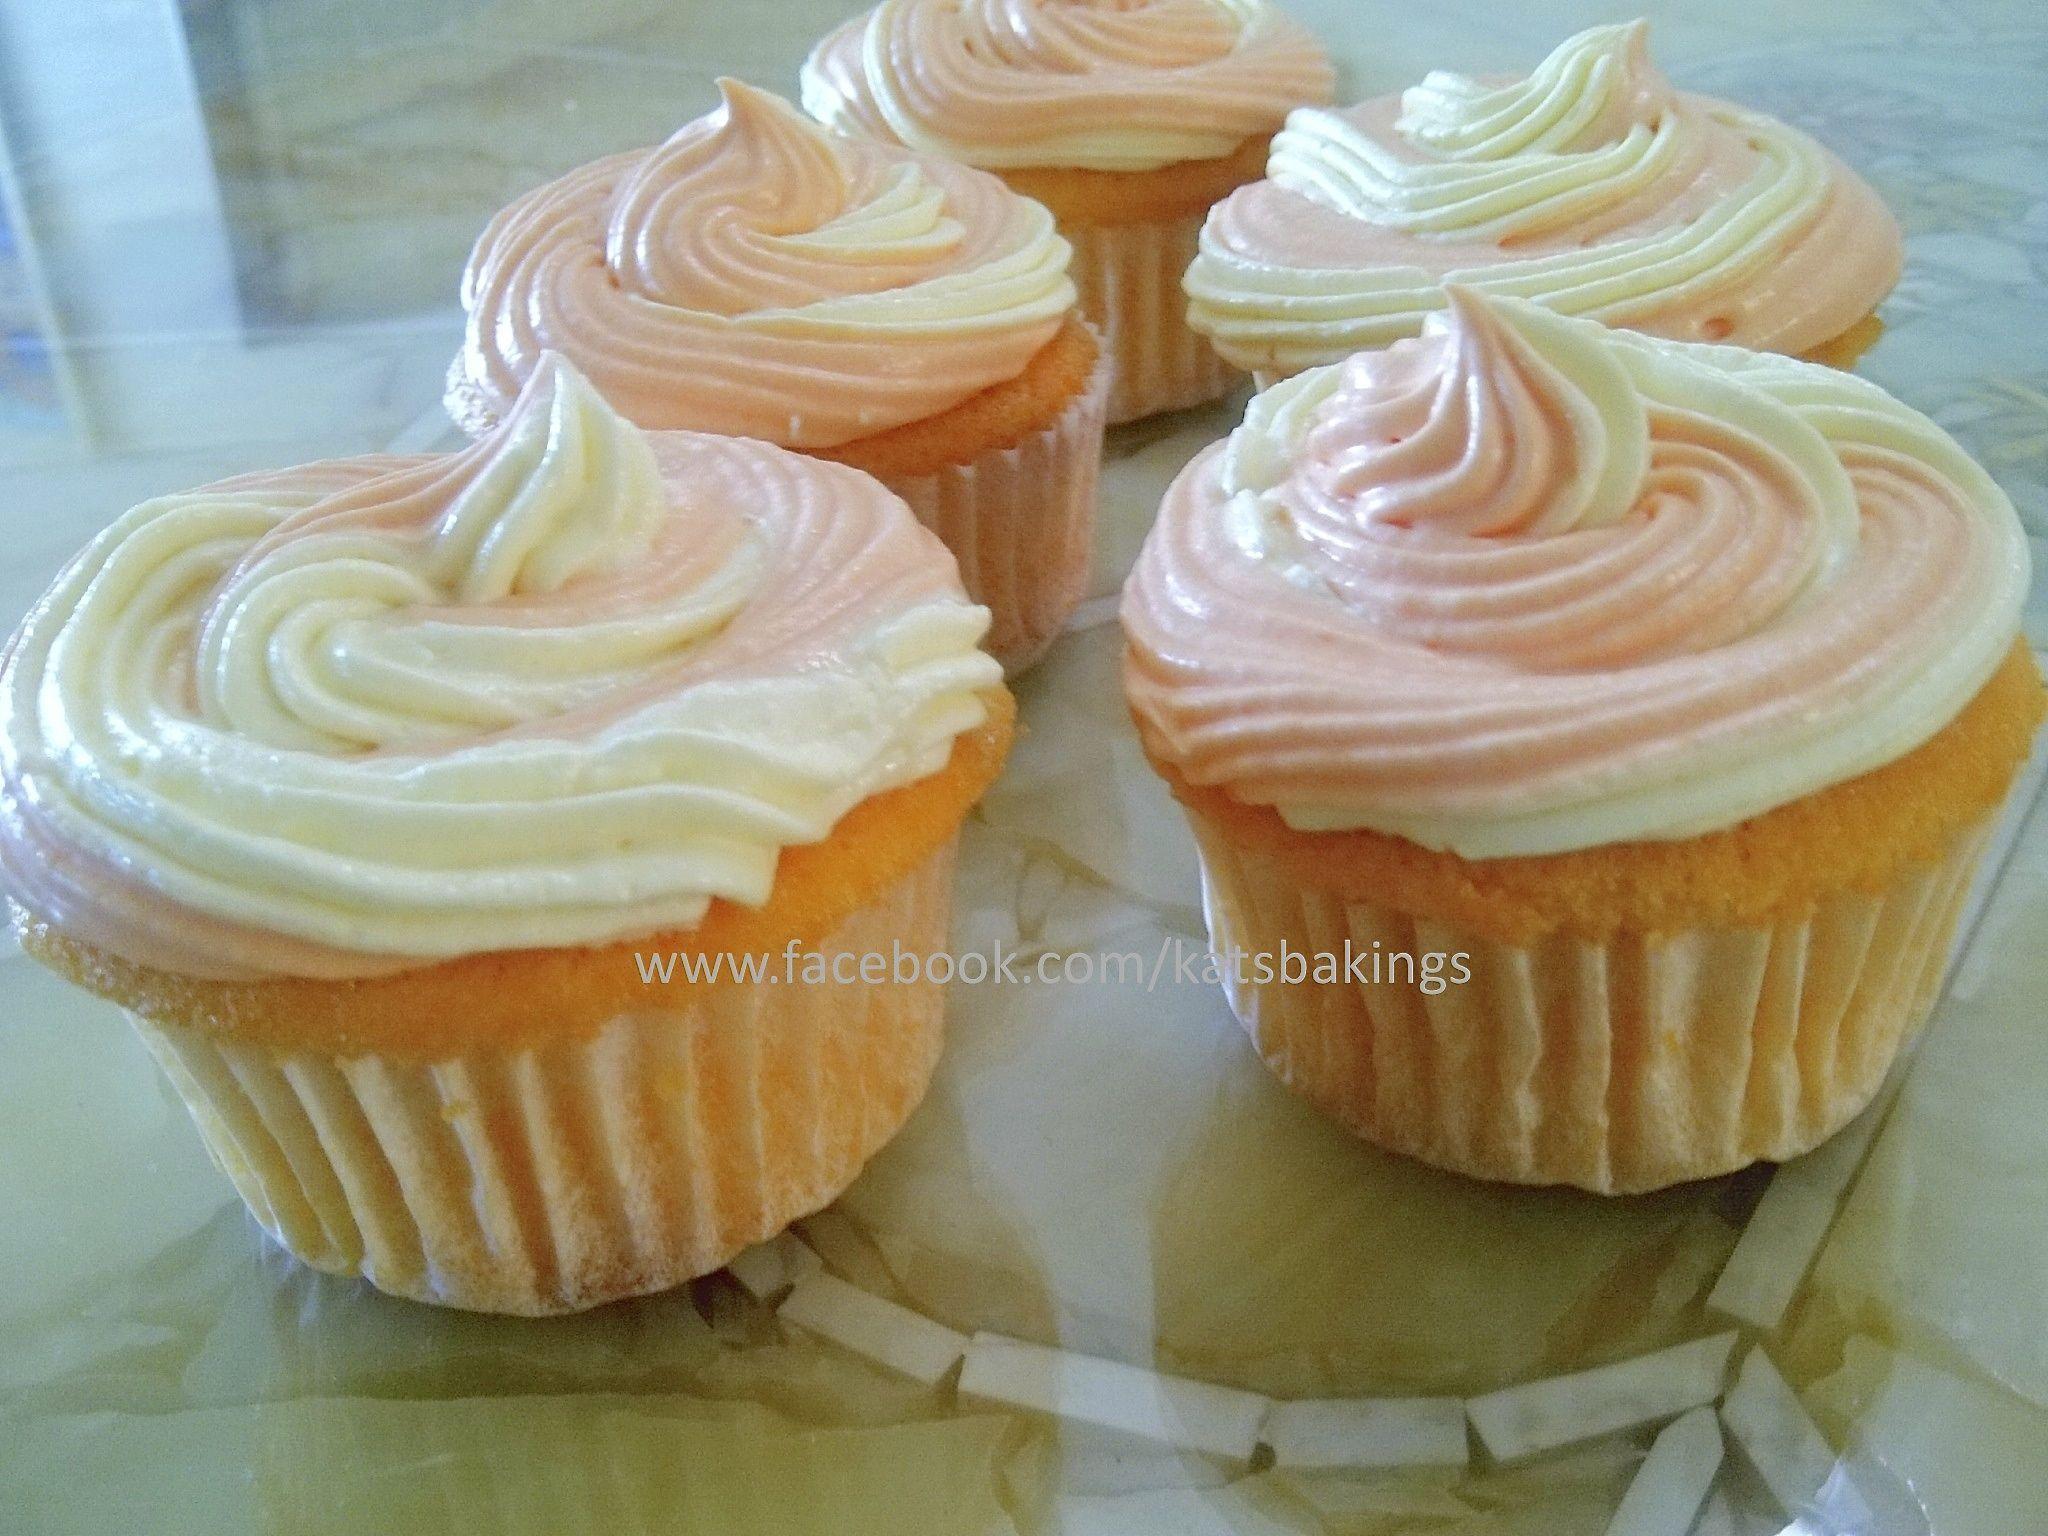 Orange Creamsicle Cupcake with Marshmallow Fluff frosting #marshmallowflufffrosting Orange Creamsicle Cupcake with Marshmallow Fluff frosting #marshmallowflufffrosting Orange Creamsicle Cupcake with Marshmallow Fluff frosting #marshmallowflufffrosting Orange Creamsicle Cupcake with Marshmallow Fluff frosting #homemademarshmallowfluff